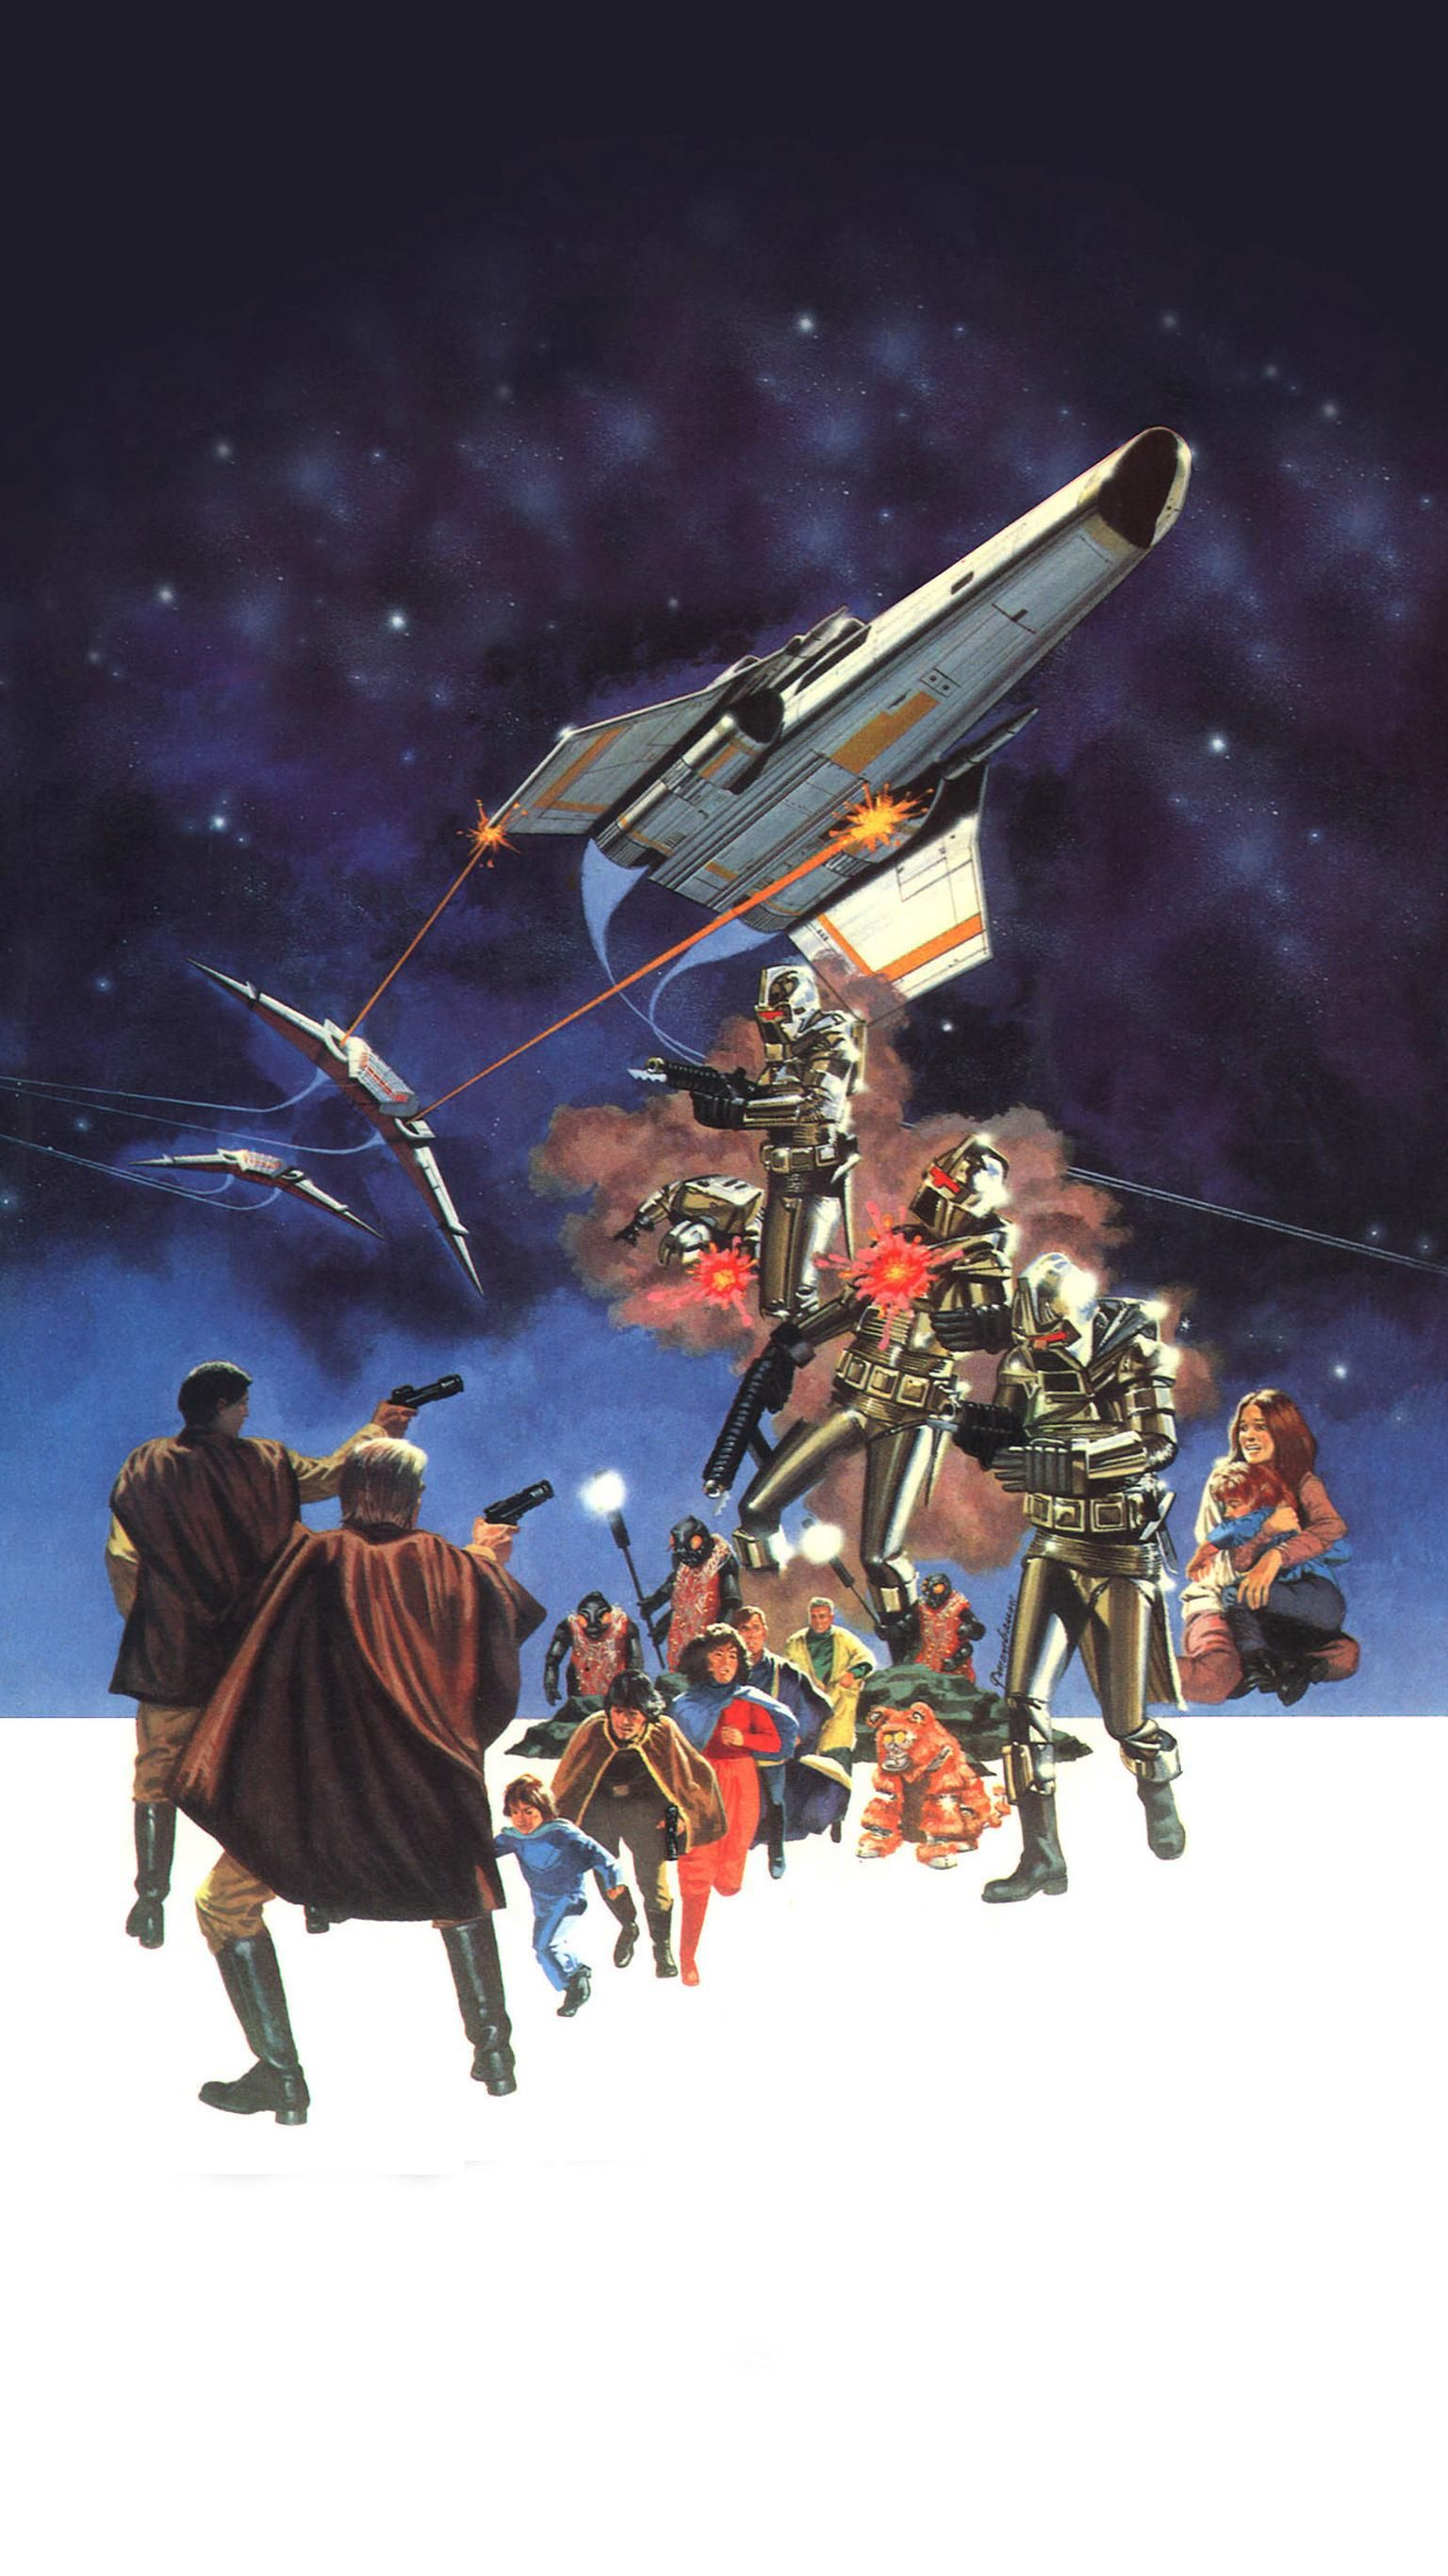 Battlestar Galactica Phone Wallpaper Moviemania Scifi Fantasy Art Battlestar Galactica Star Trek Posters